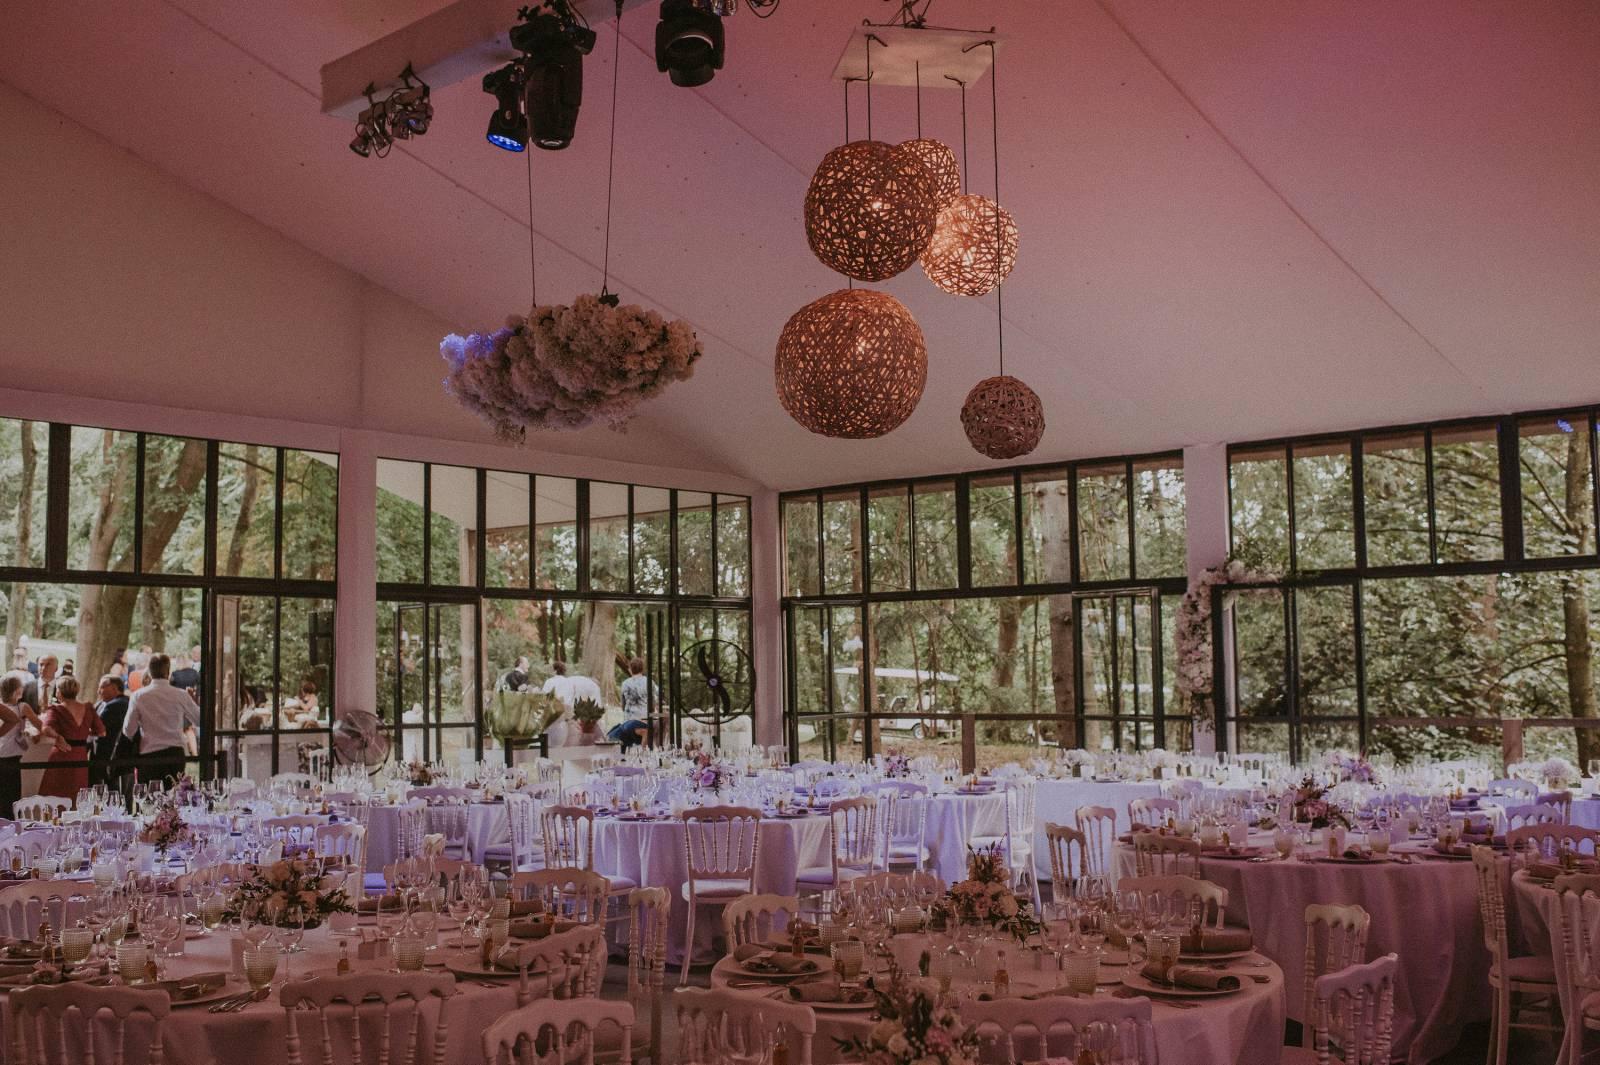 Excellence Weddings - House of Weddings - Aurélien ScArt (21)